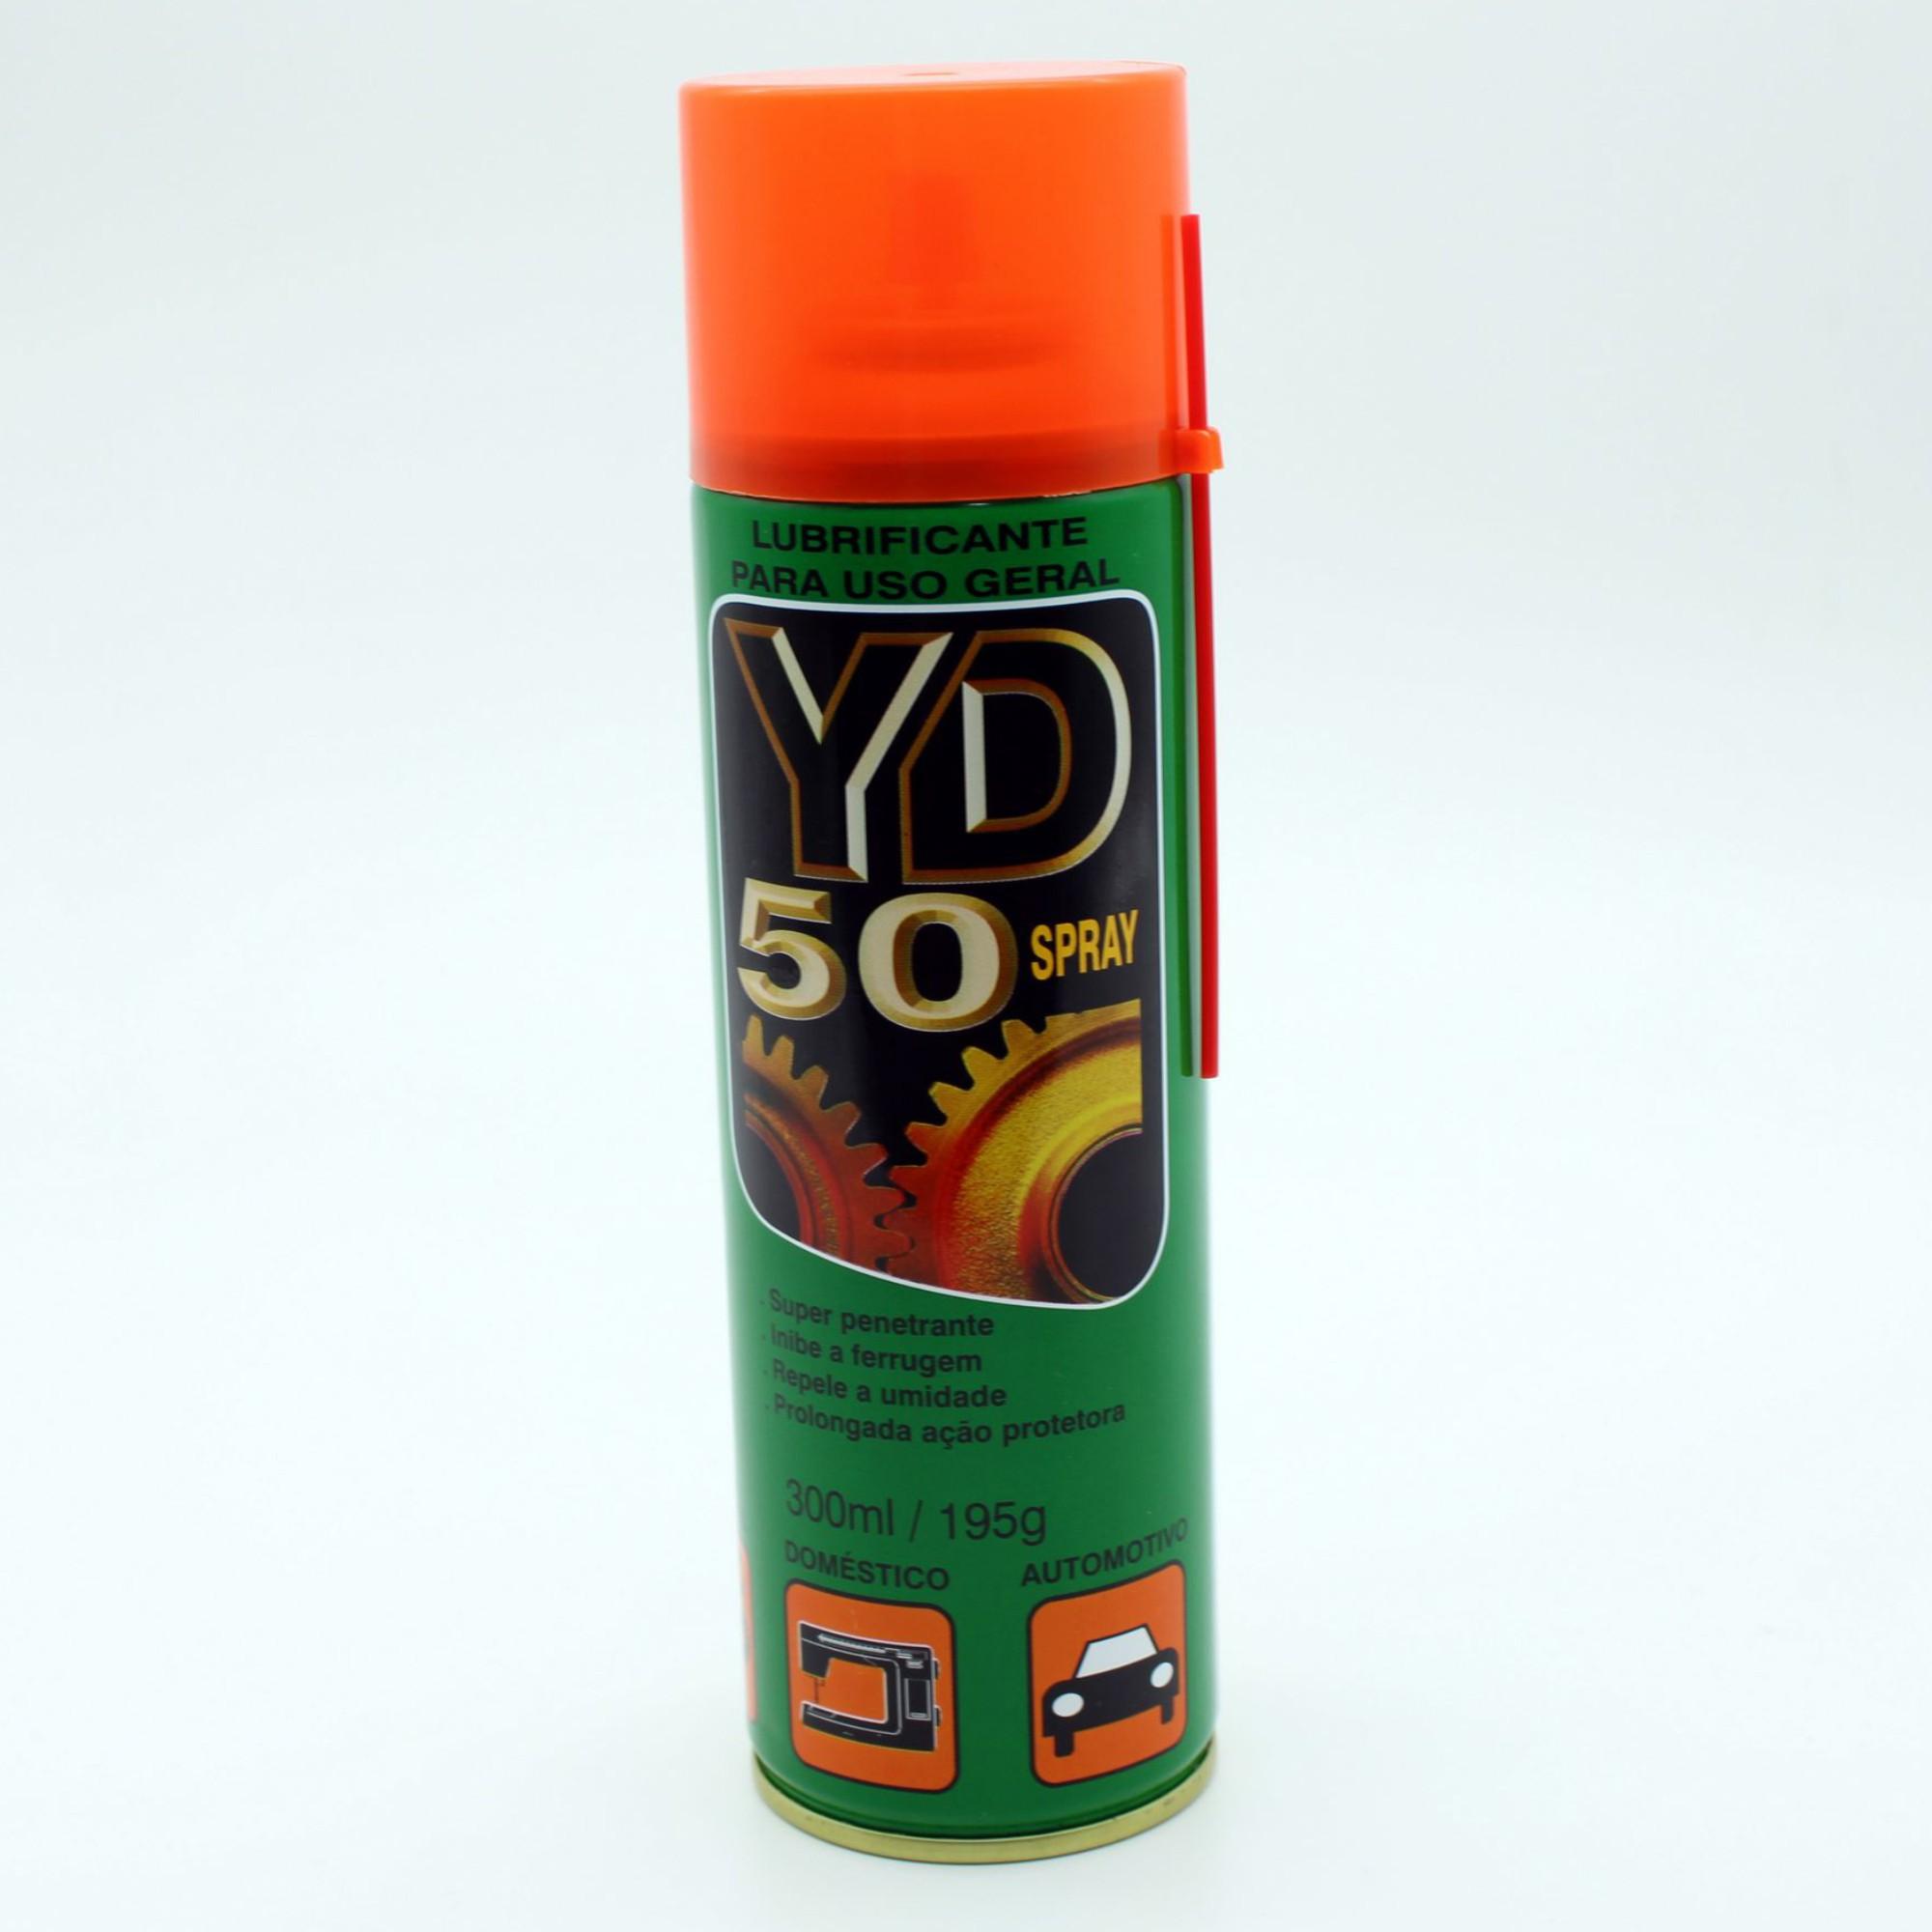 Desengripante Multiuso Lubrificante Antiferrugem Yd50